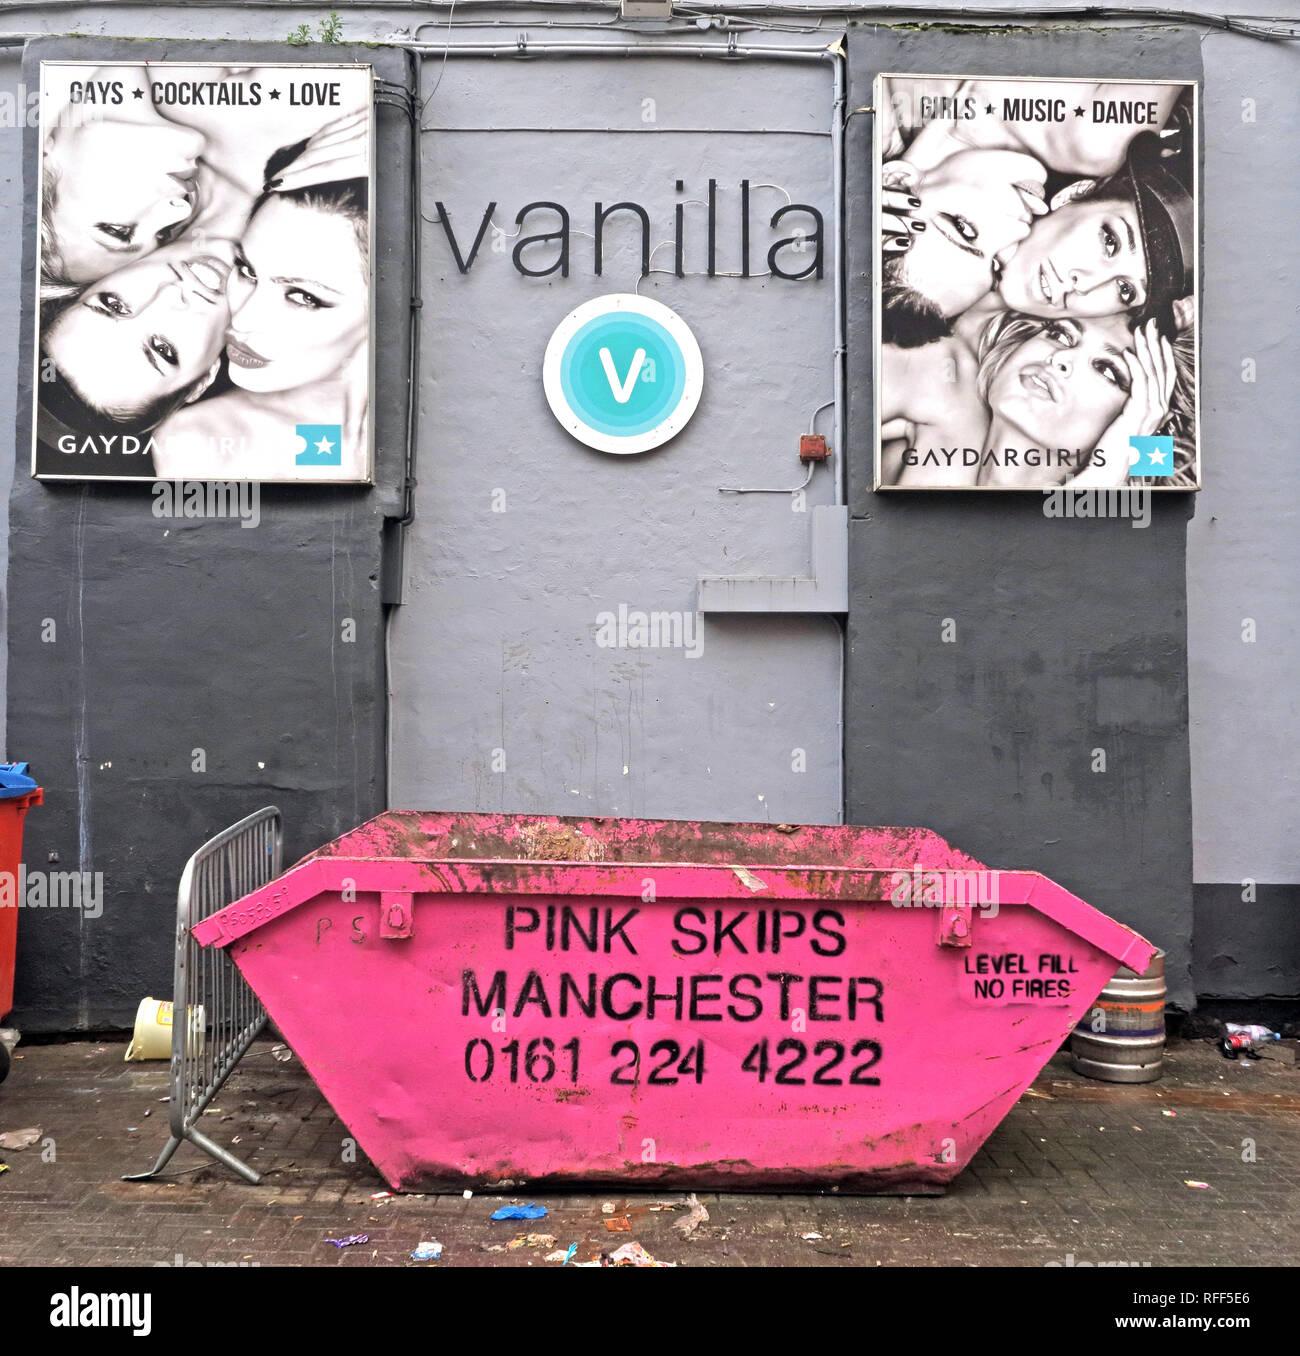 Manchester,City centre,city,@HotpixUK,HotpixUK,GoTonySmith,North West England,UK,England,Canal Street,Gay Village,gay,village,Sackville,LGBT,LGBTI community,LGBTI,community,pink,skip,bar,pub,club,Vanilla Nightclub,01612244222,Lancs,Lancashire,Gay Pink Skips,Pink Skips Manchester Ltd Skip Hire,Pink Skips Manchester Ltd,waste,recycling,Domestic customers,commercial customers,domestic,business